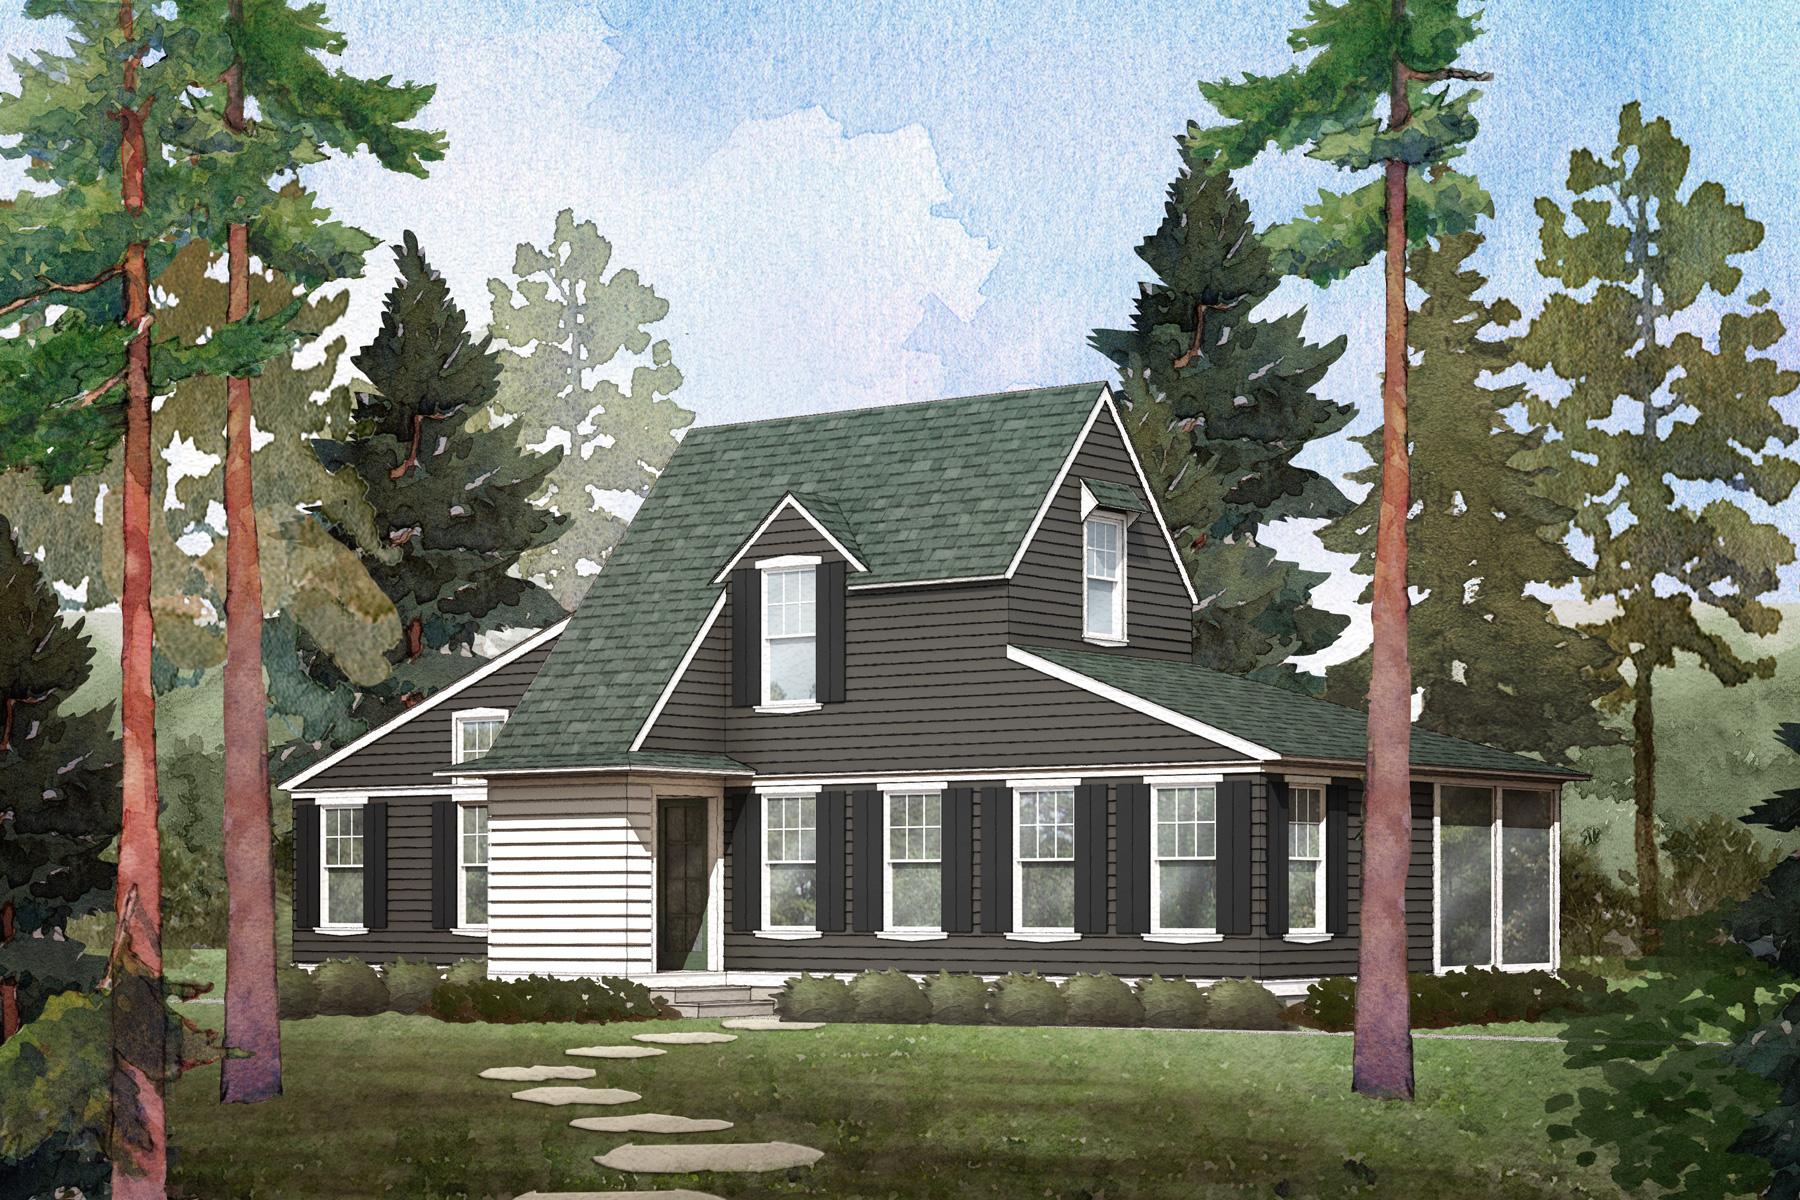 Maine-color-scheme-1-final-website.jpg